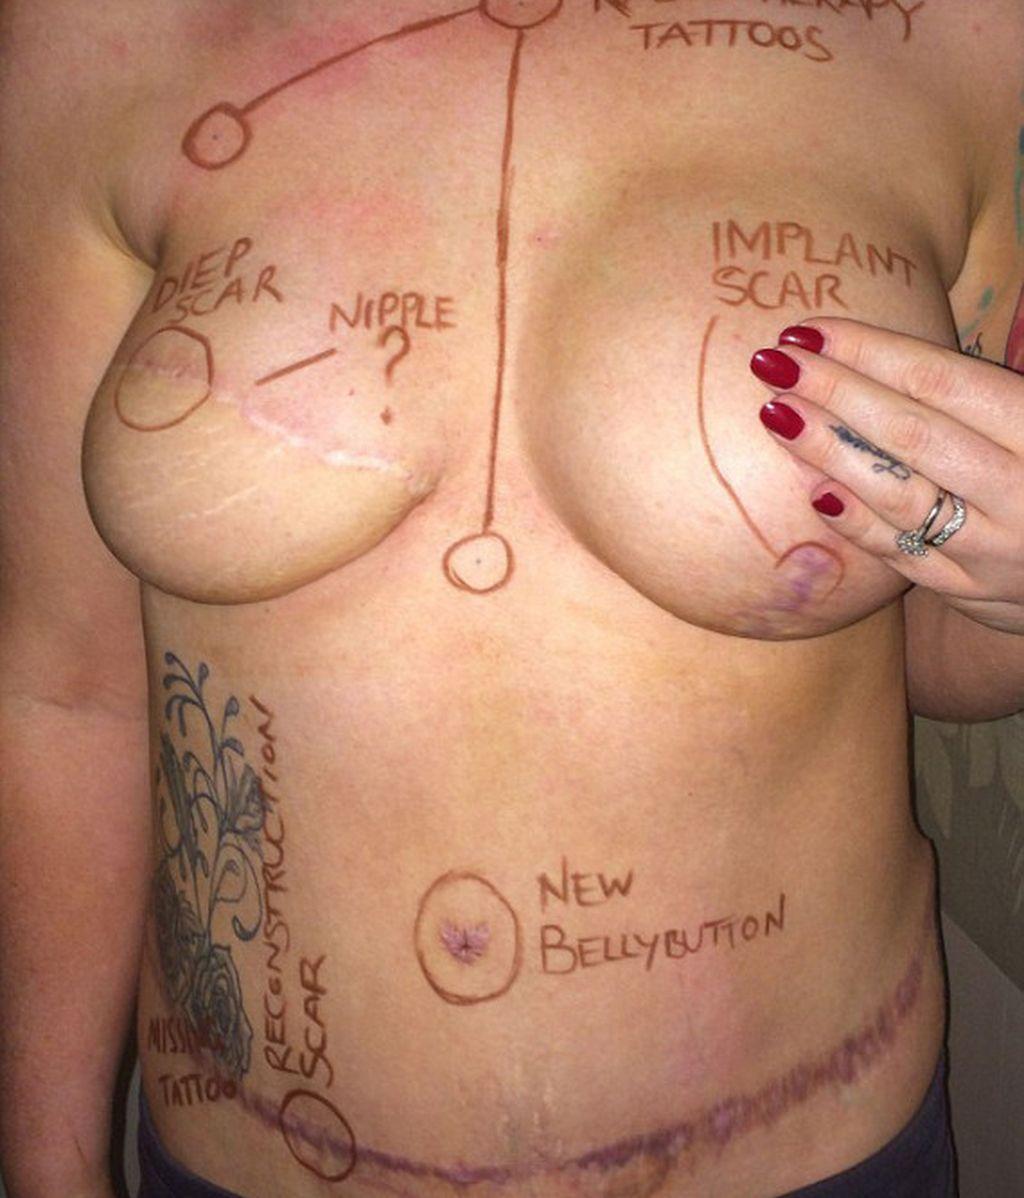 scar-nipples-pics-girl-dildoing-her